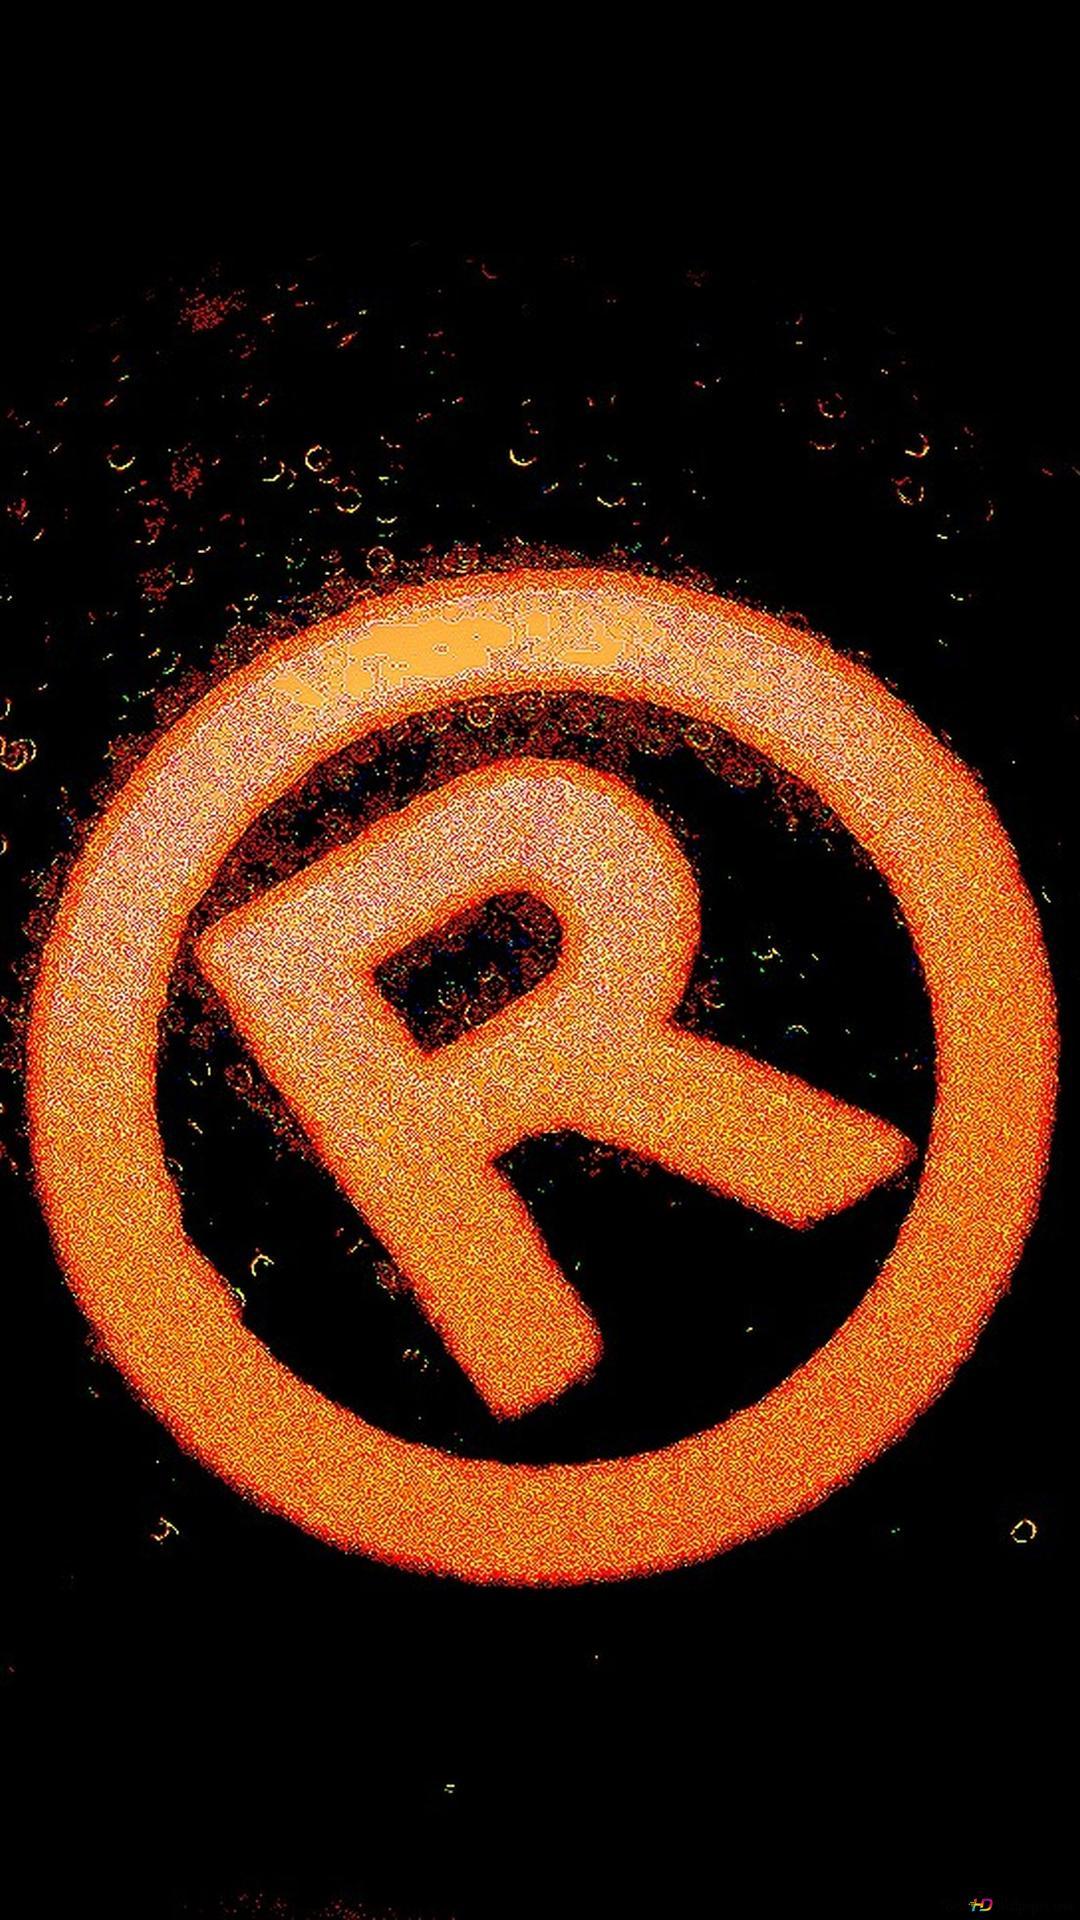 Registered Dark Logo Wallpaper Hd Wallpaper Download